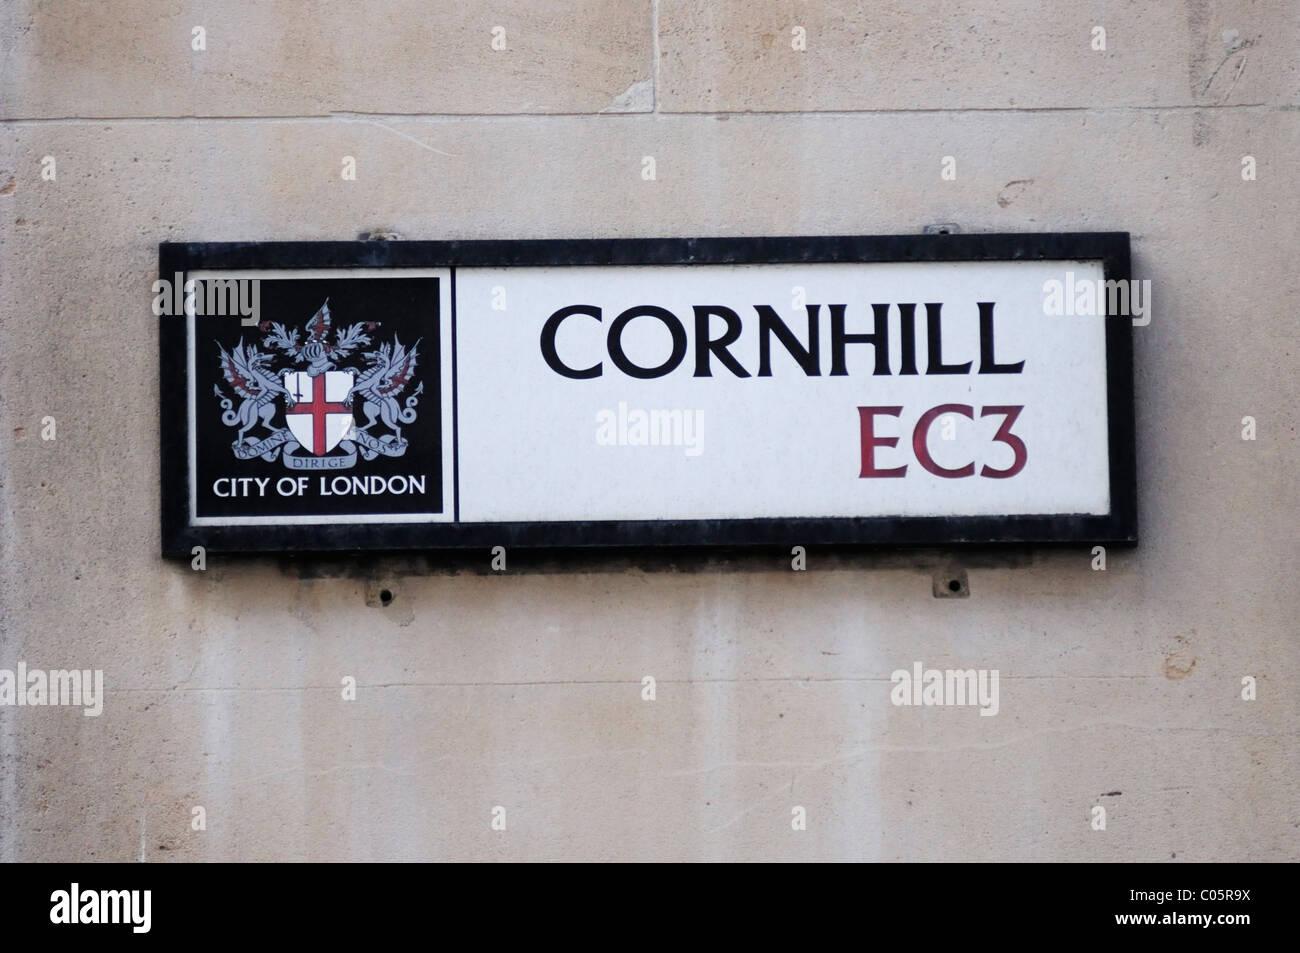 Cornhill EC3 Street Sign, London, England, UK - Stock Image